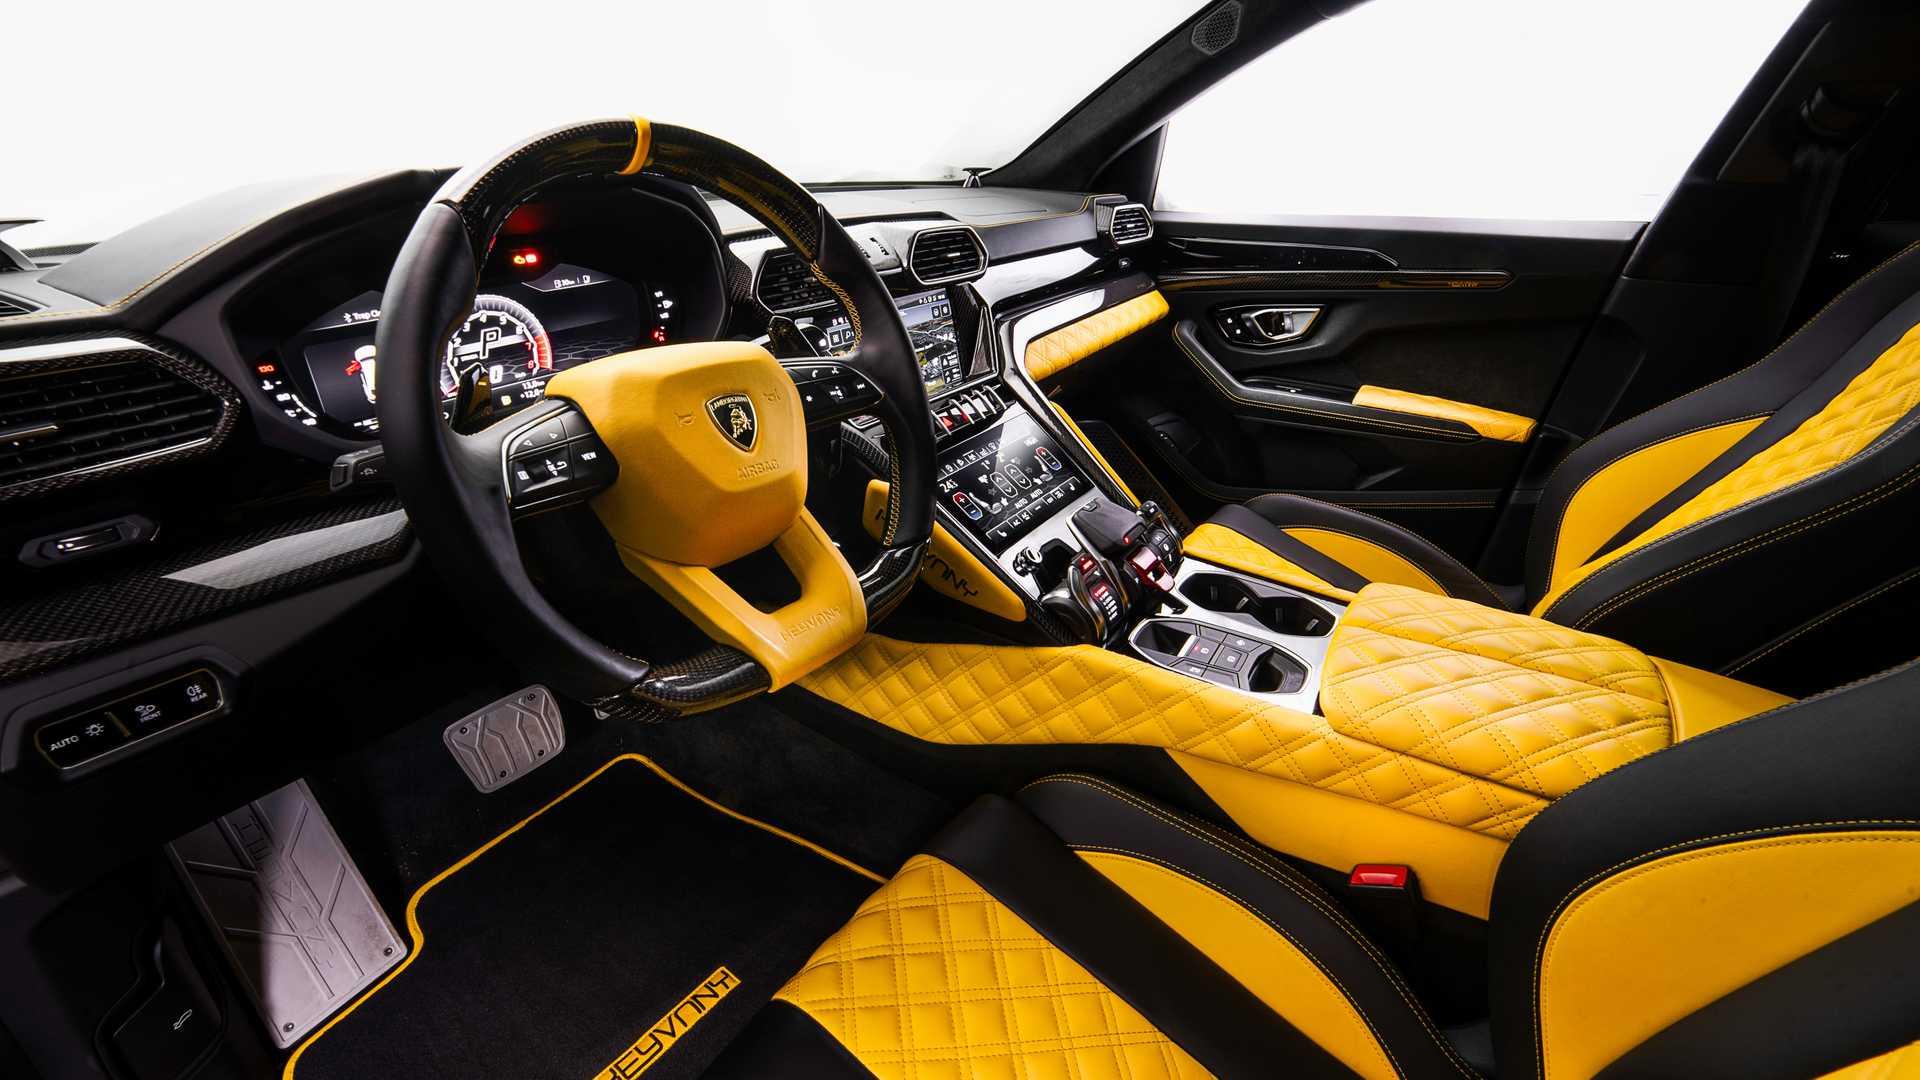 Lamborghini-Urus-by-Keyvany-17